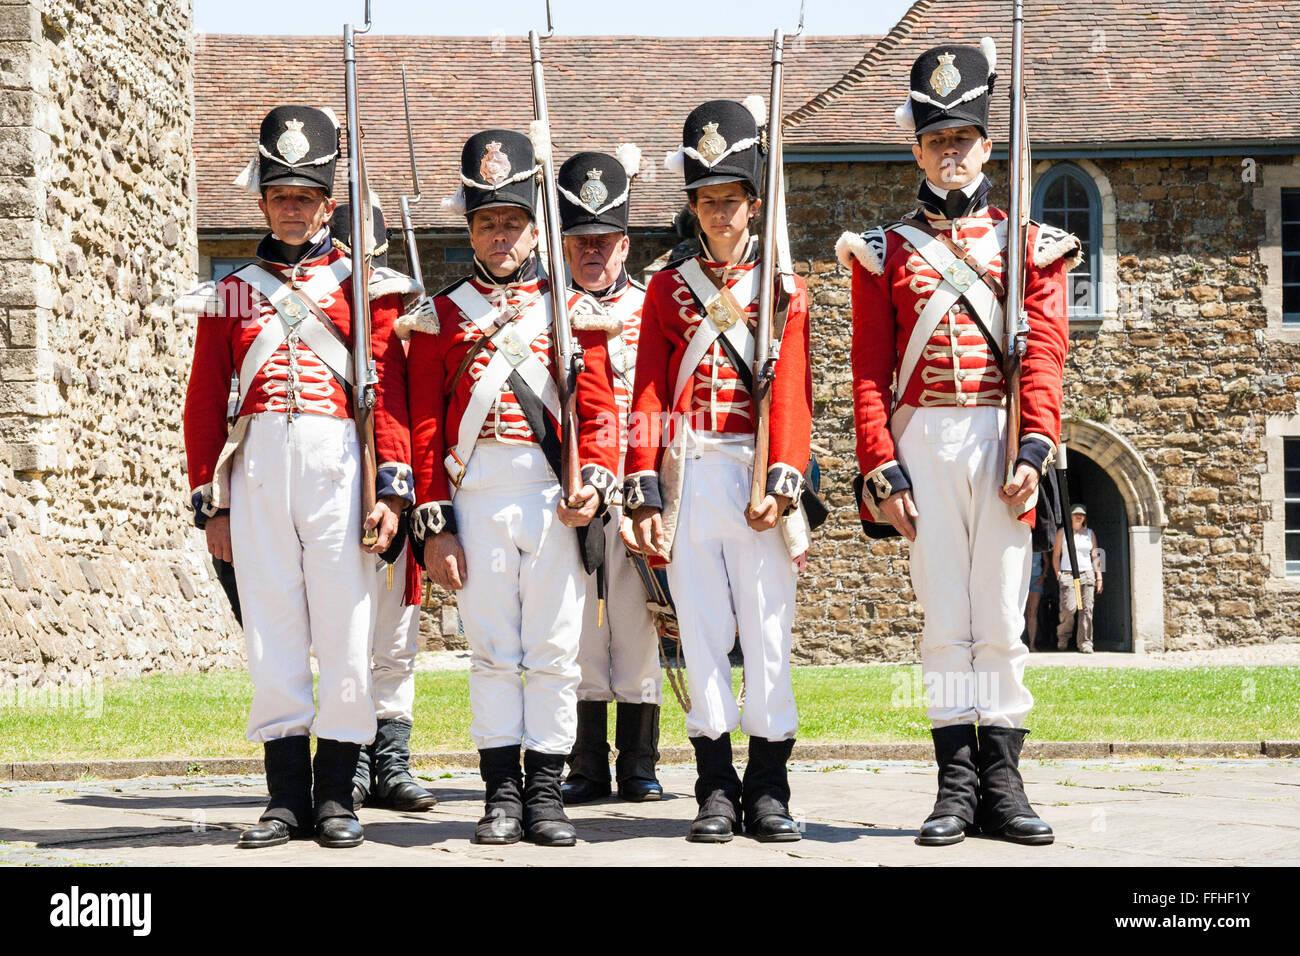 English soldier uniform